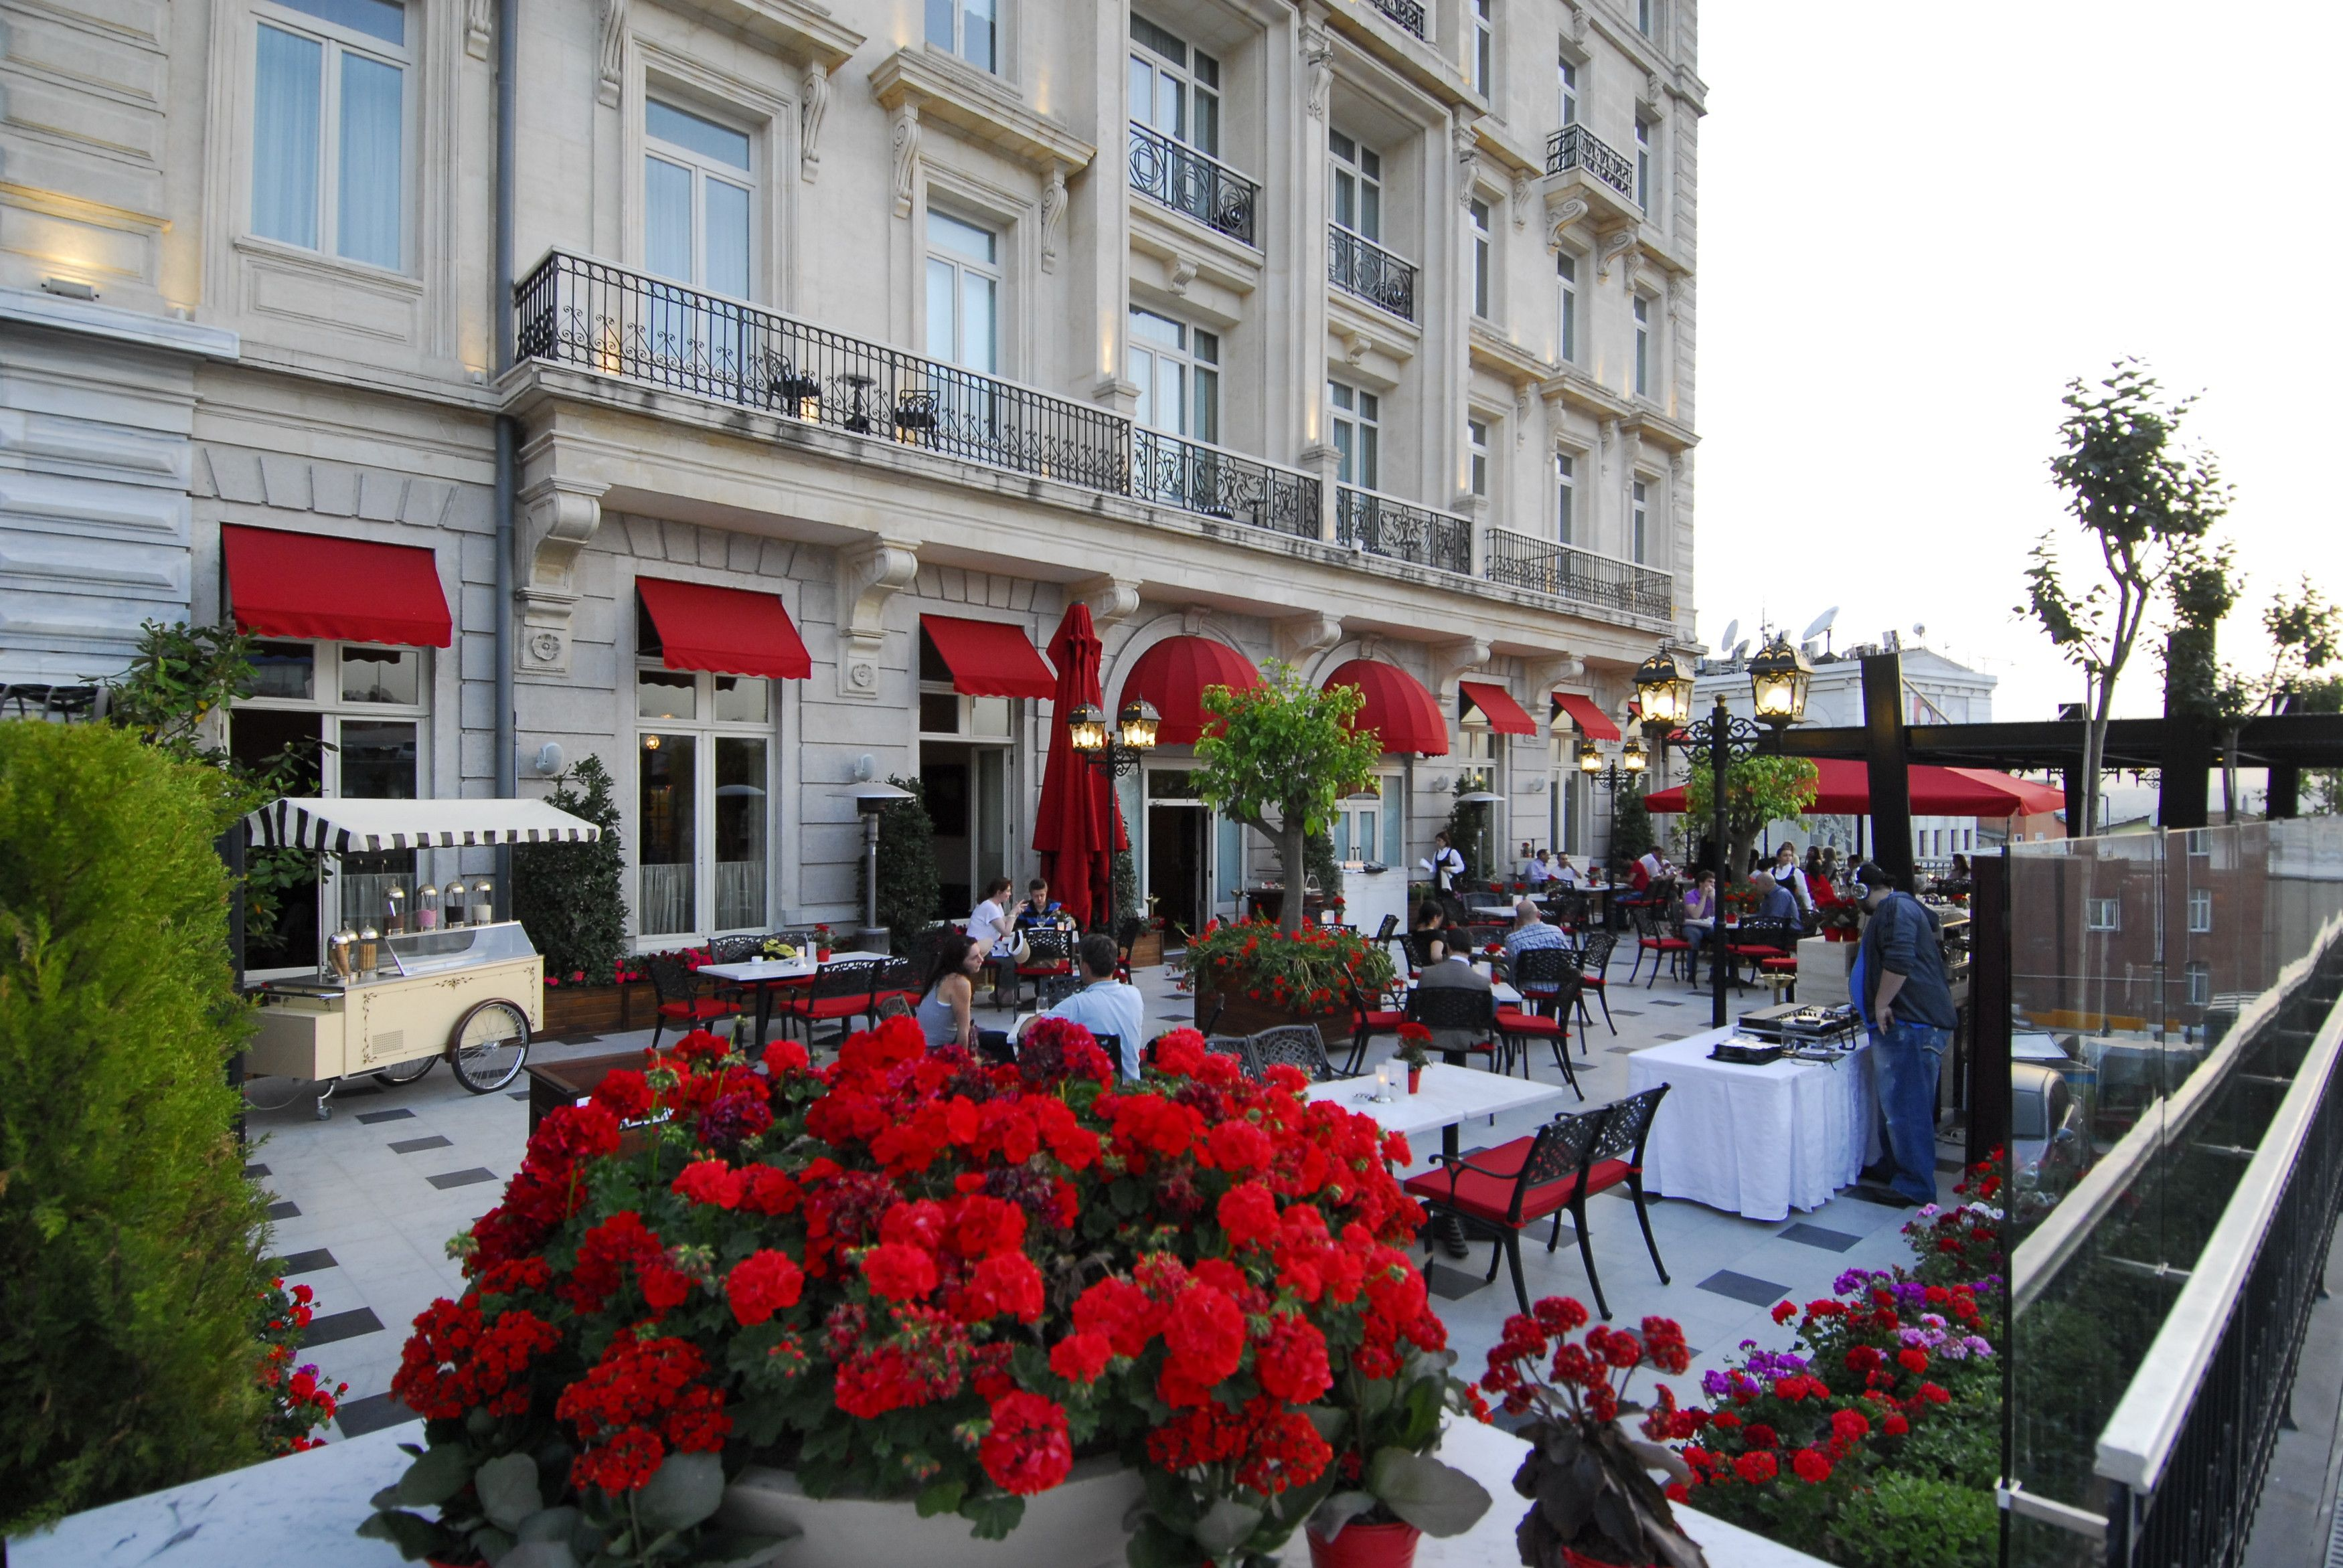 Restaurants At Pera Palace Hotel Restaurants In Istanbul Pera Pera Palace Hotel Istanbul Palace Hotel Istanbul Restaurants